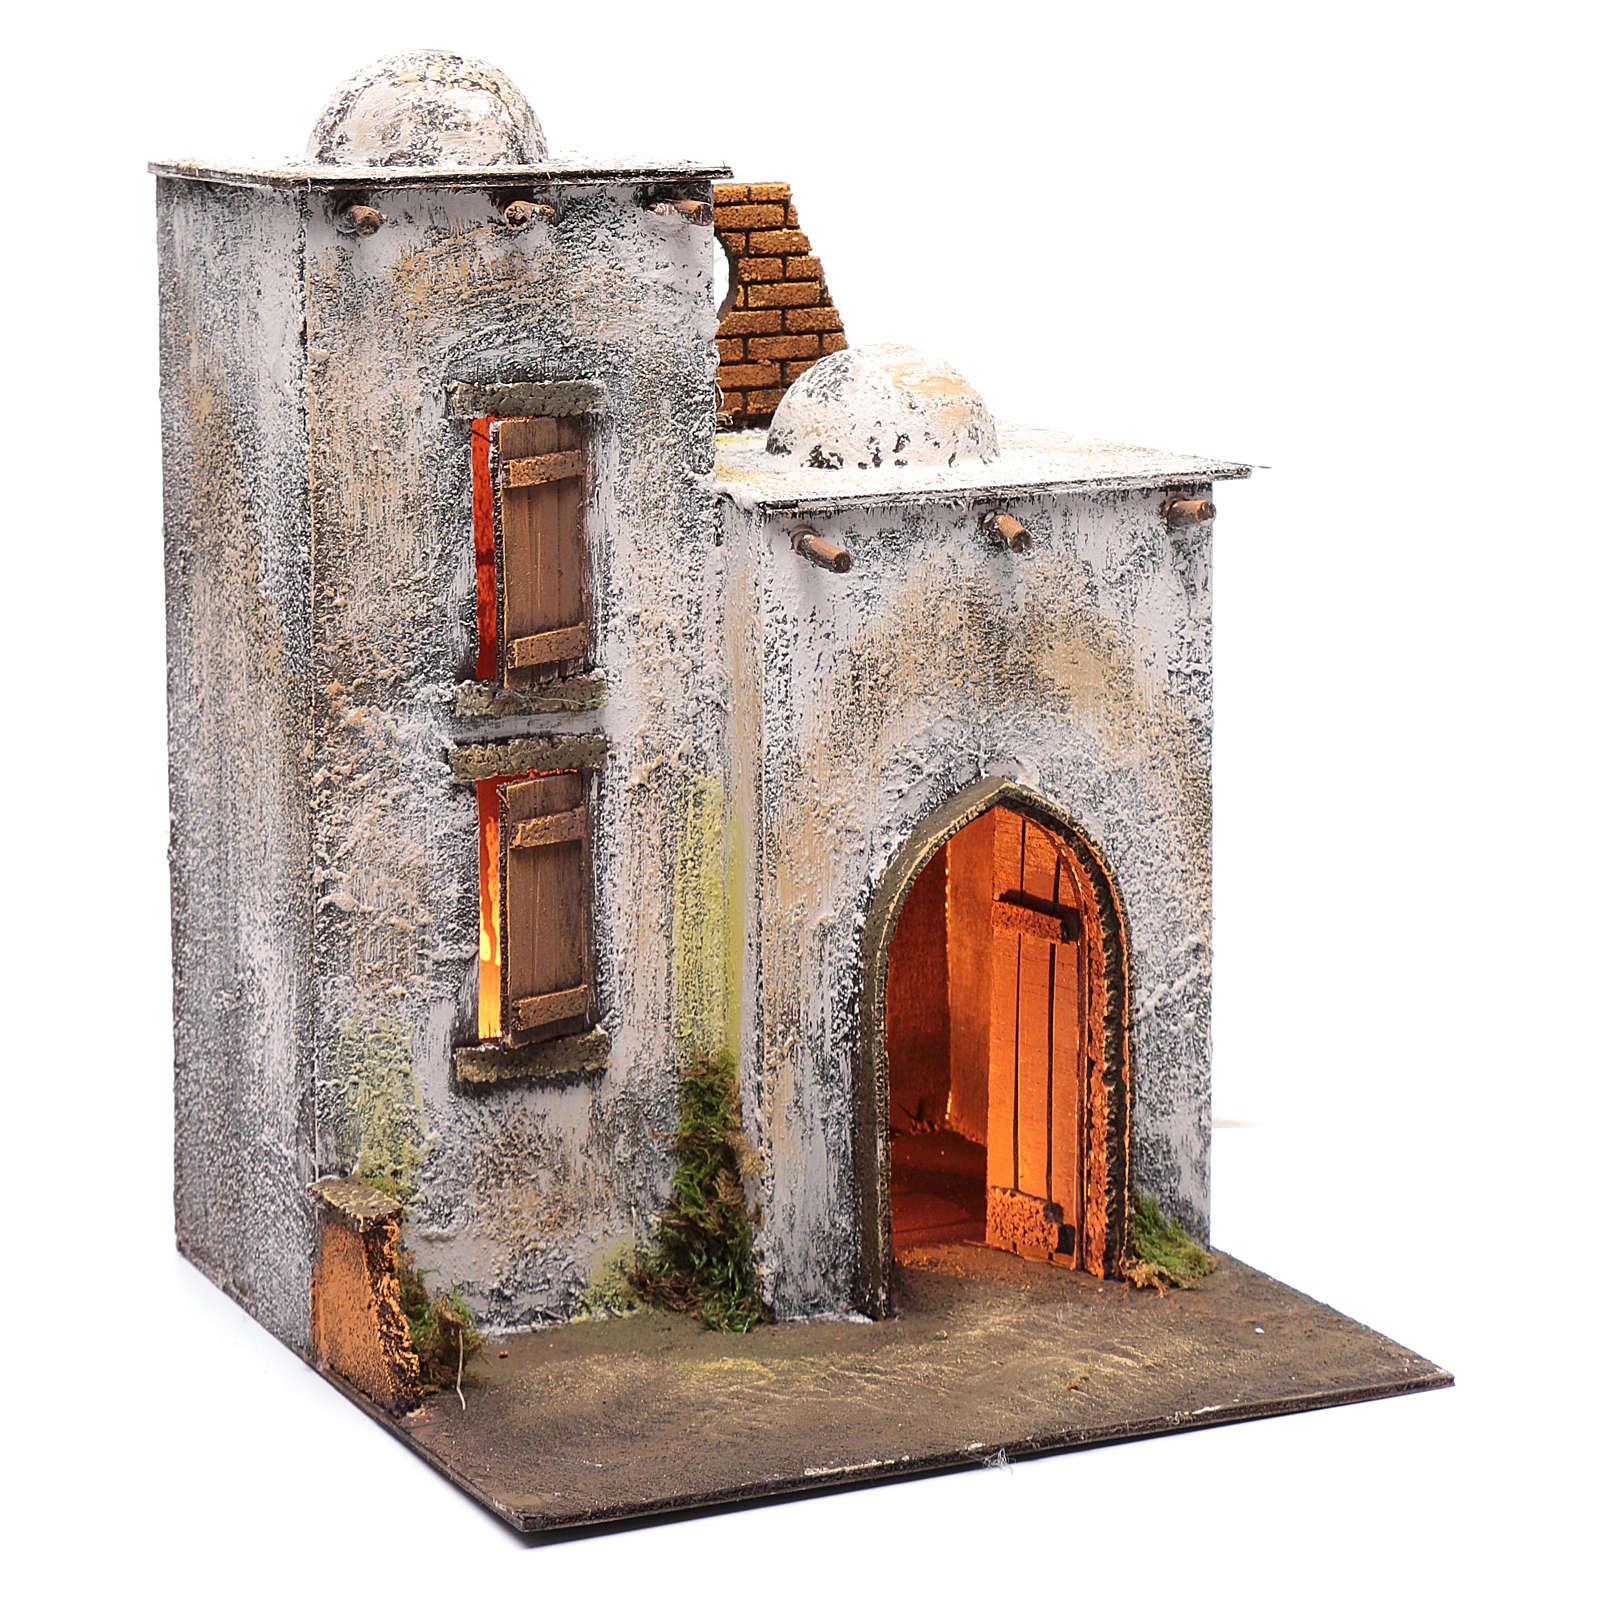 Arabian style house for Neapolitan nativity scene 4